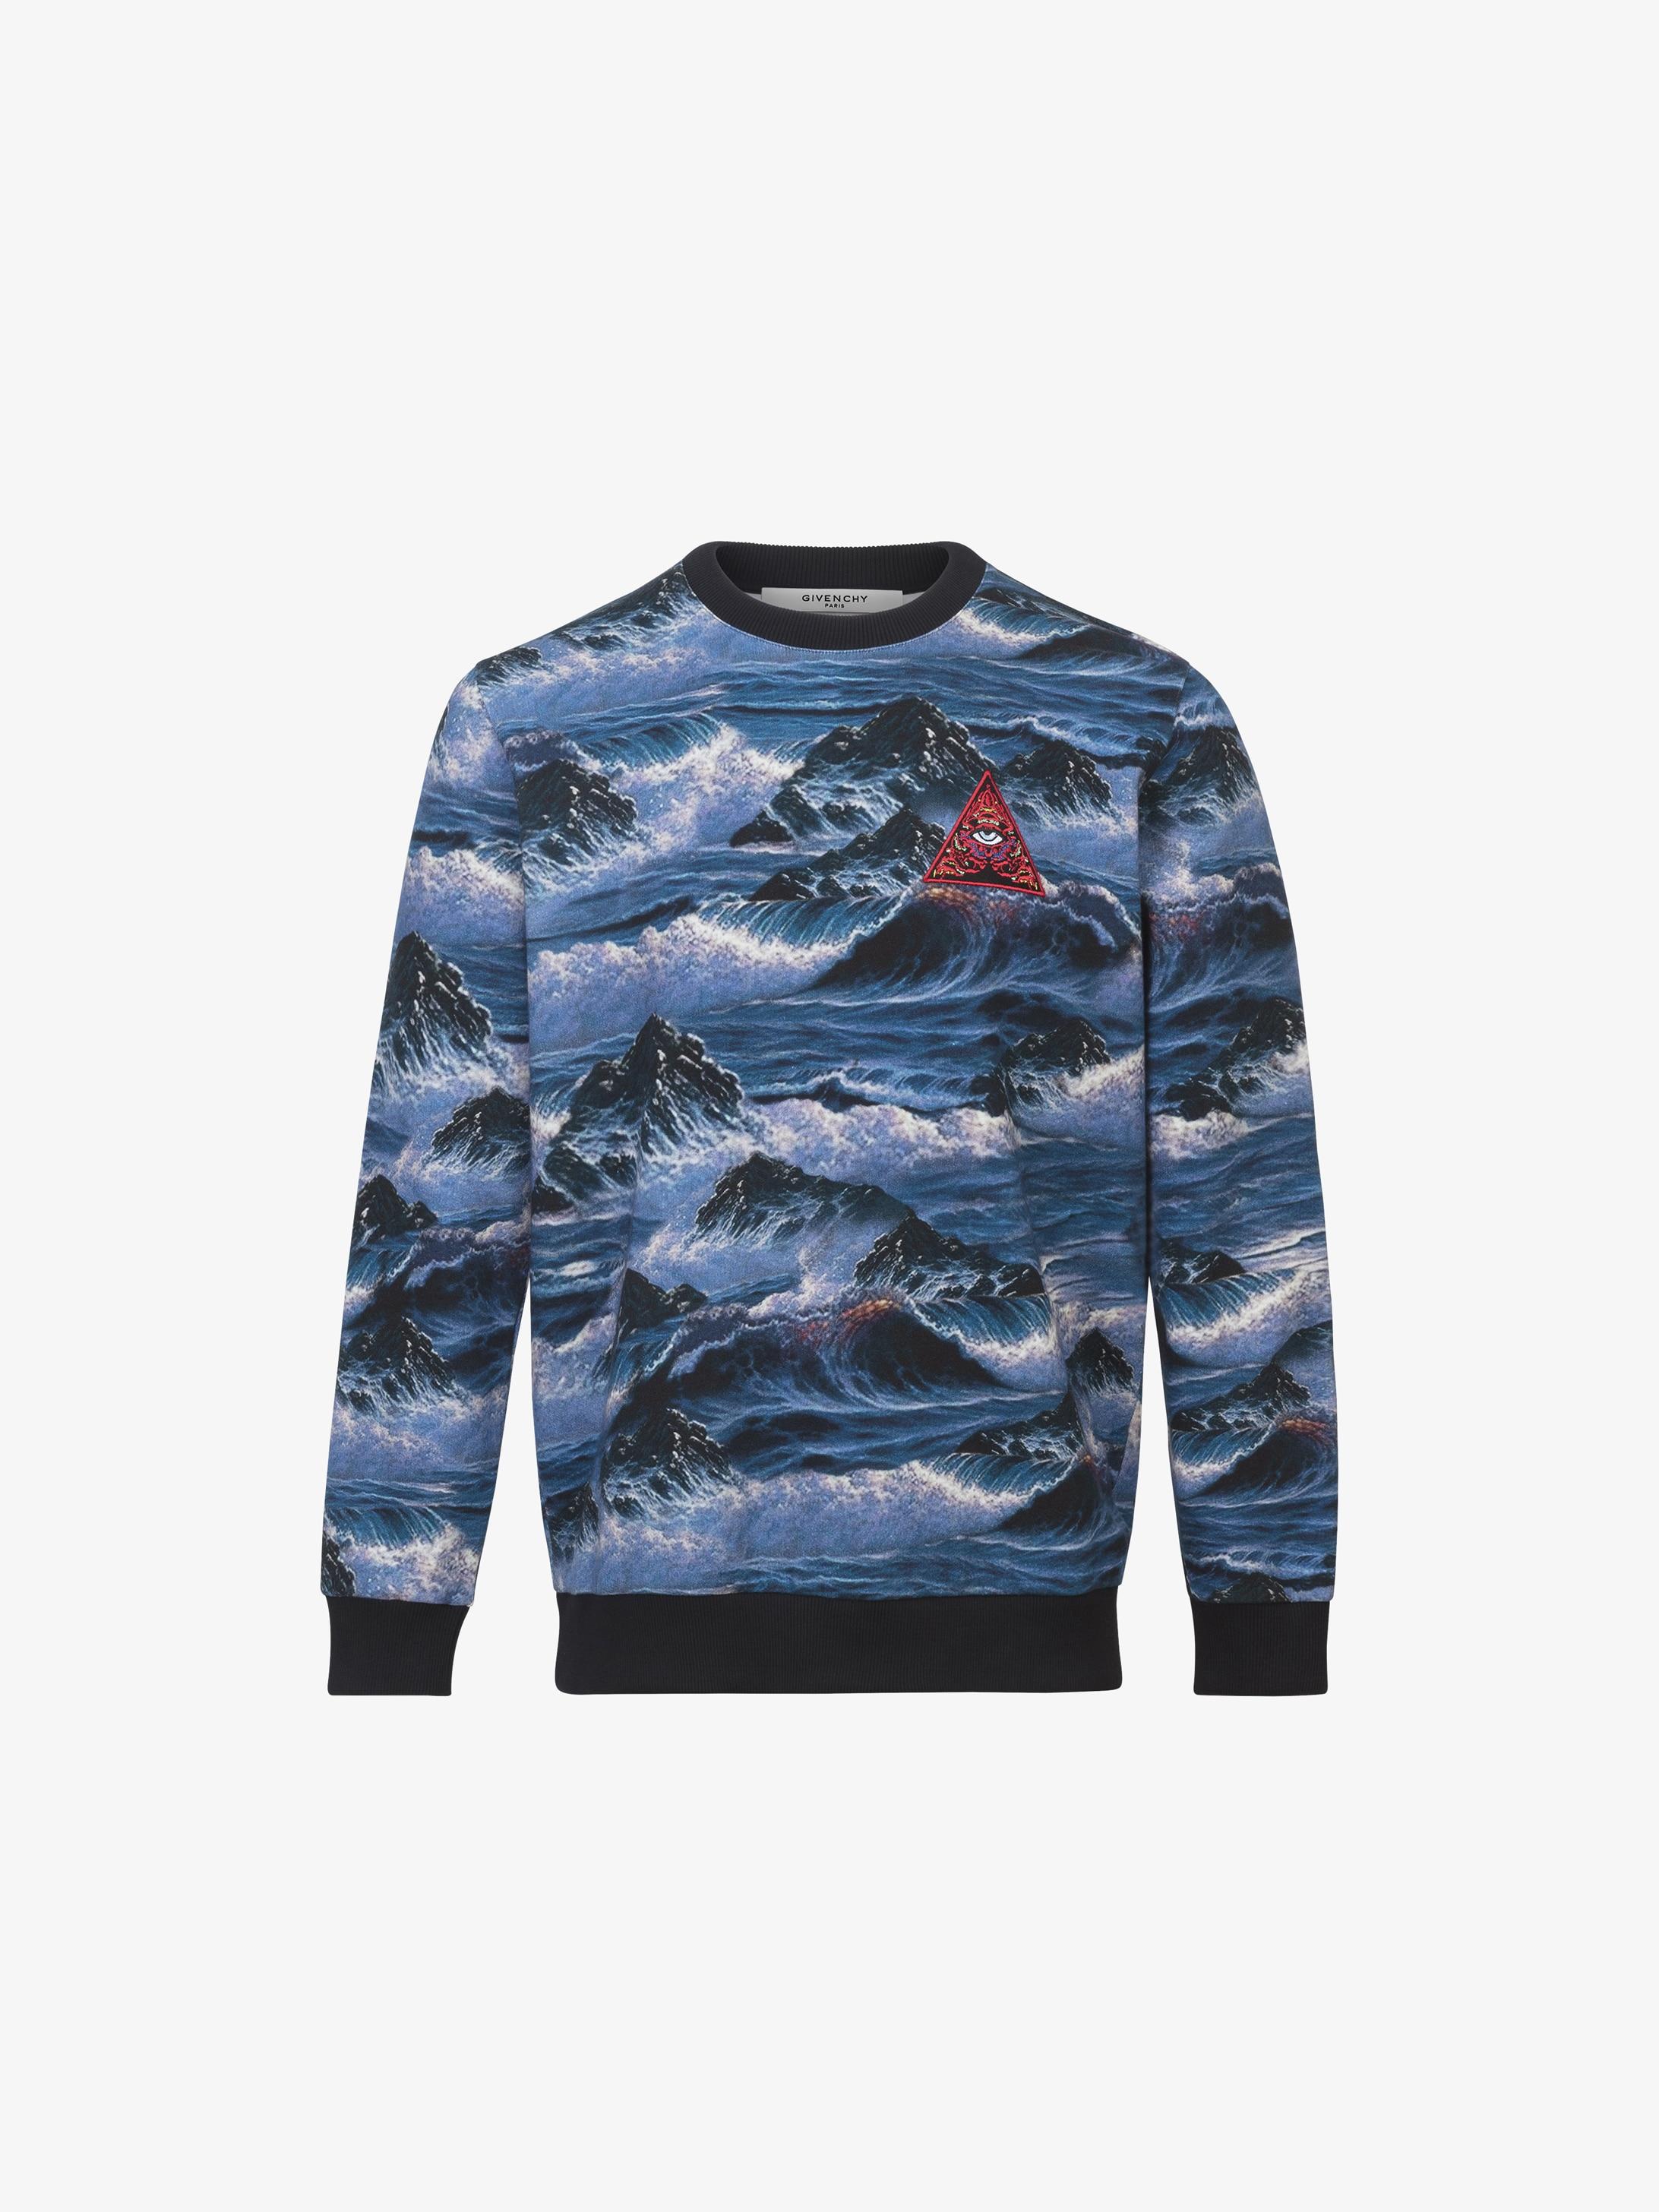 Hawaï printed sweatshirt in felpa